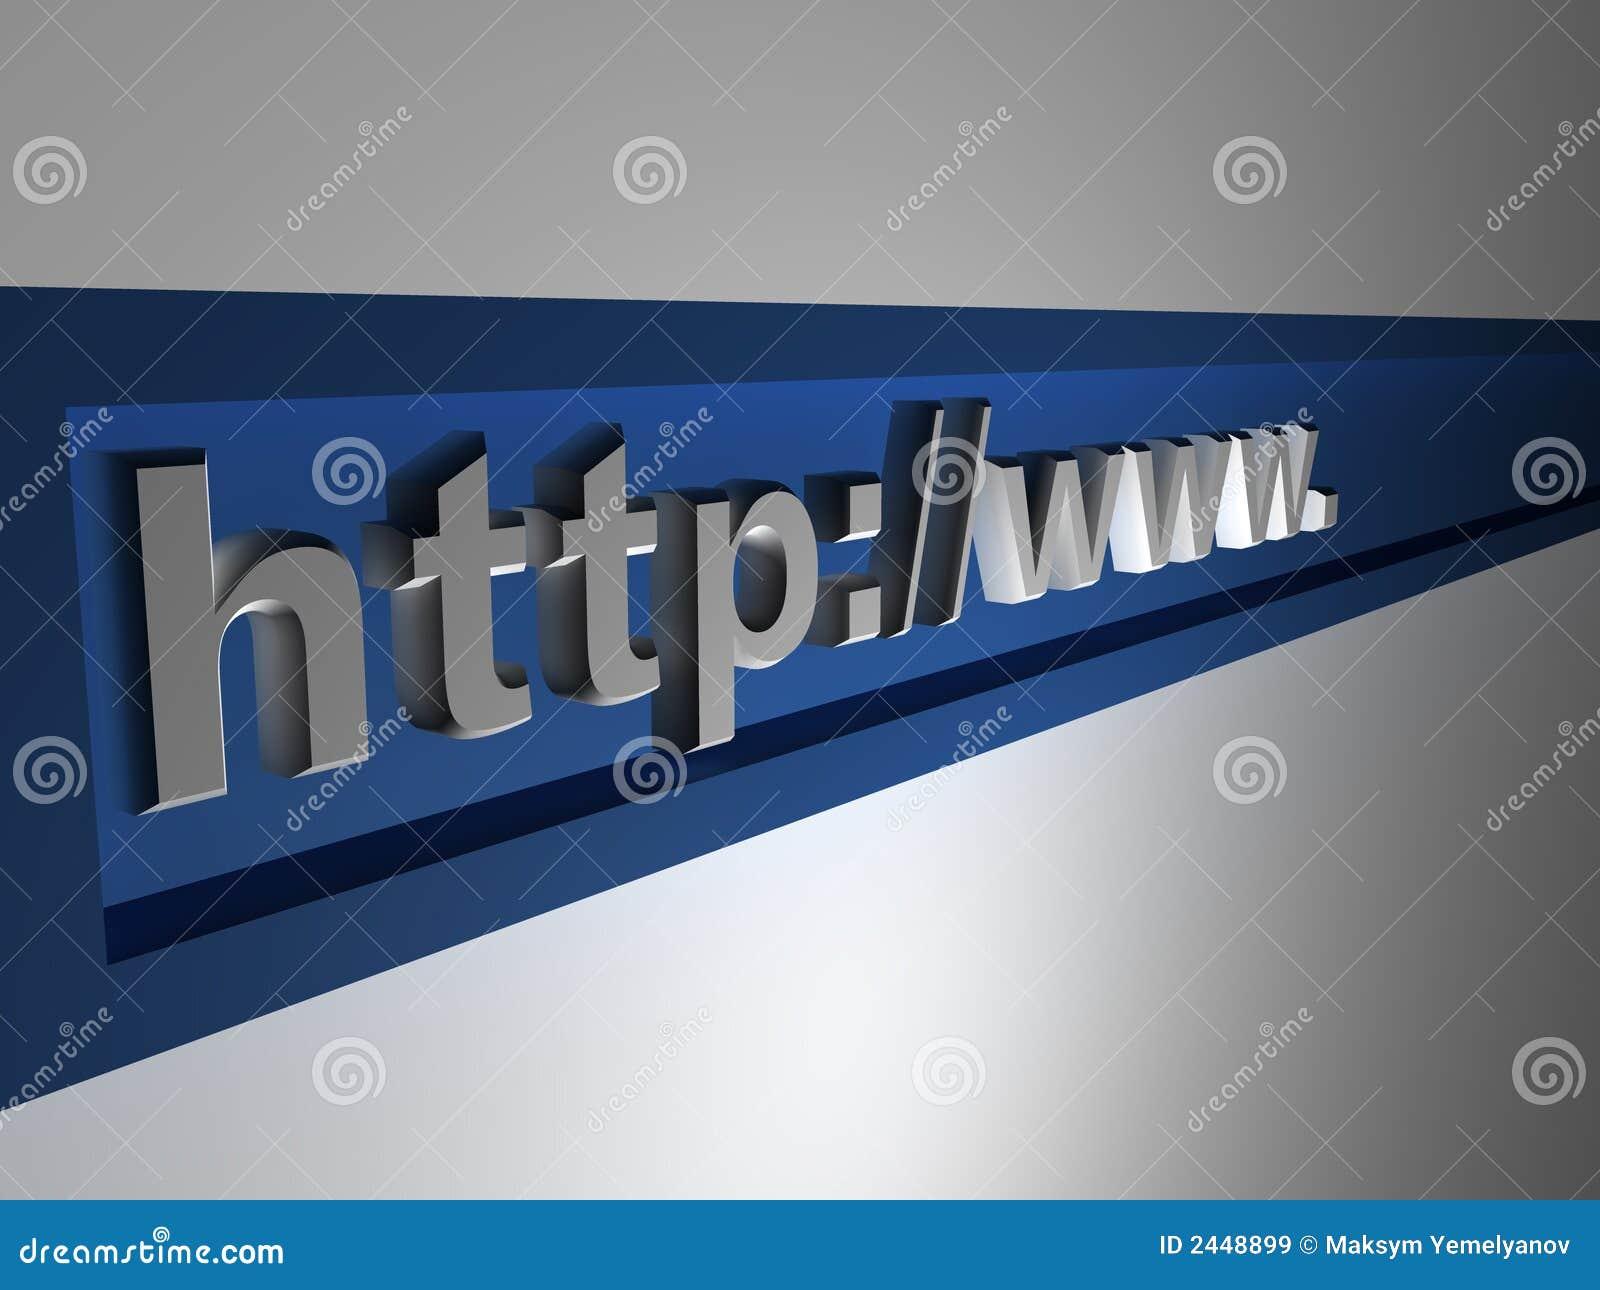 The virtual address